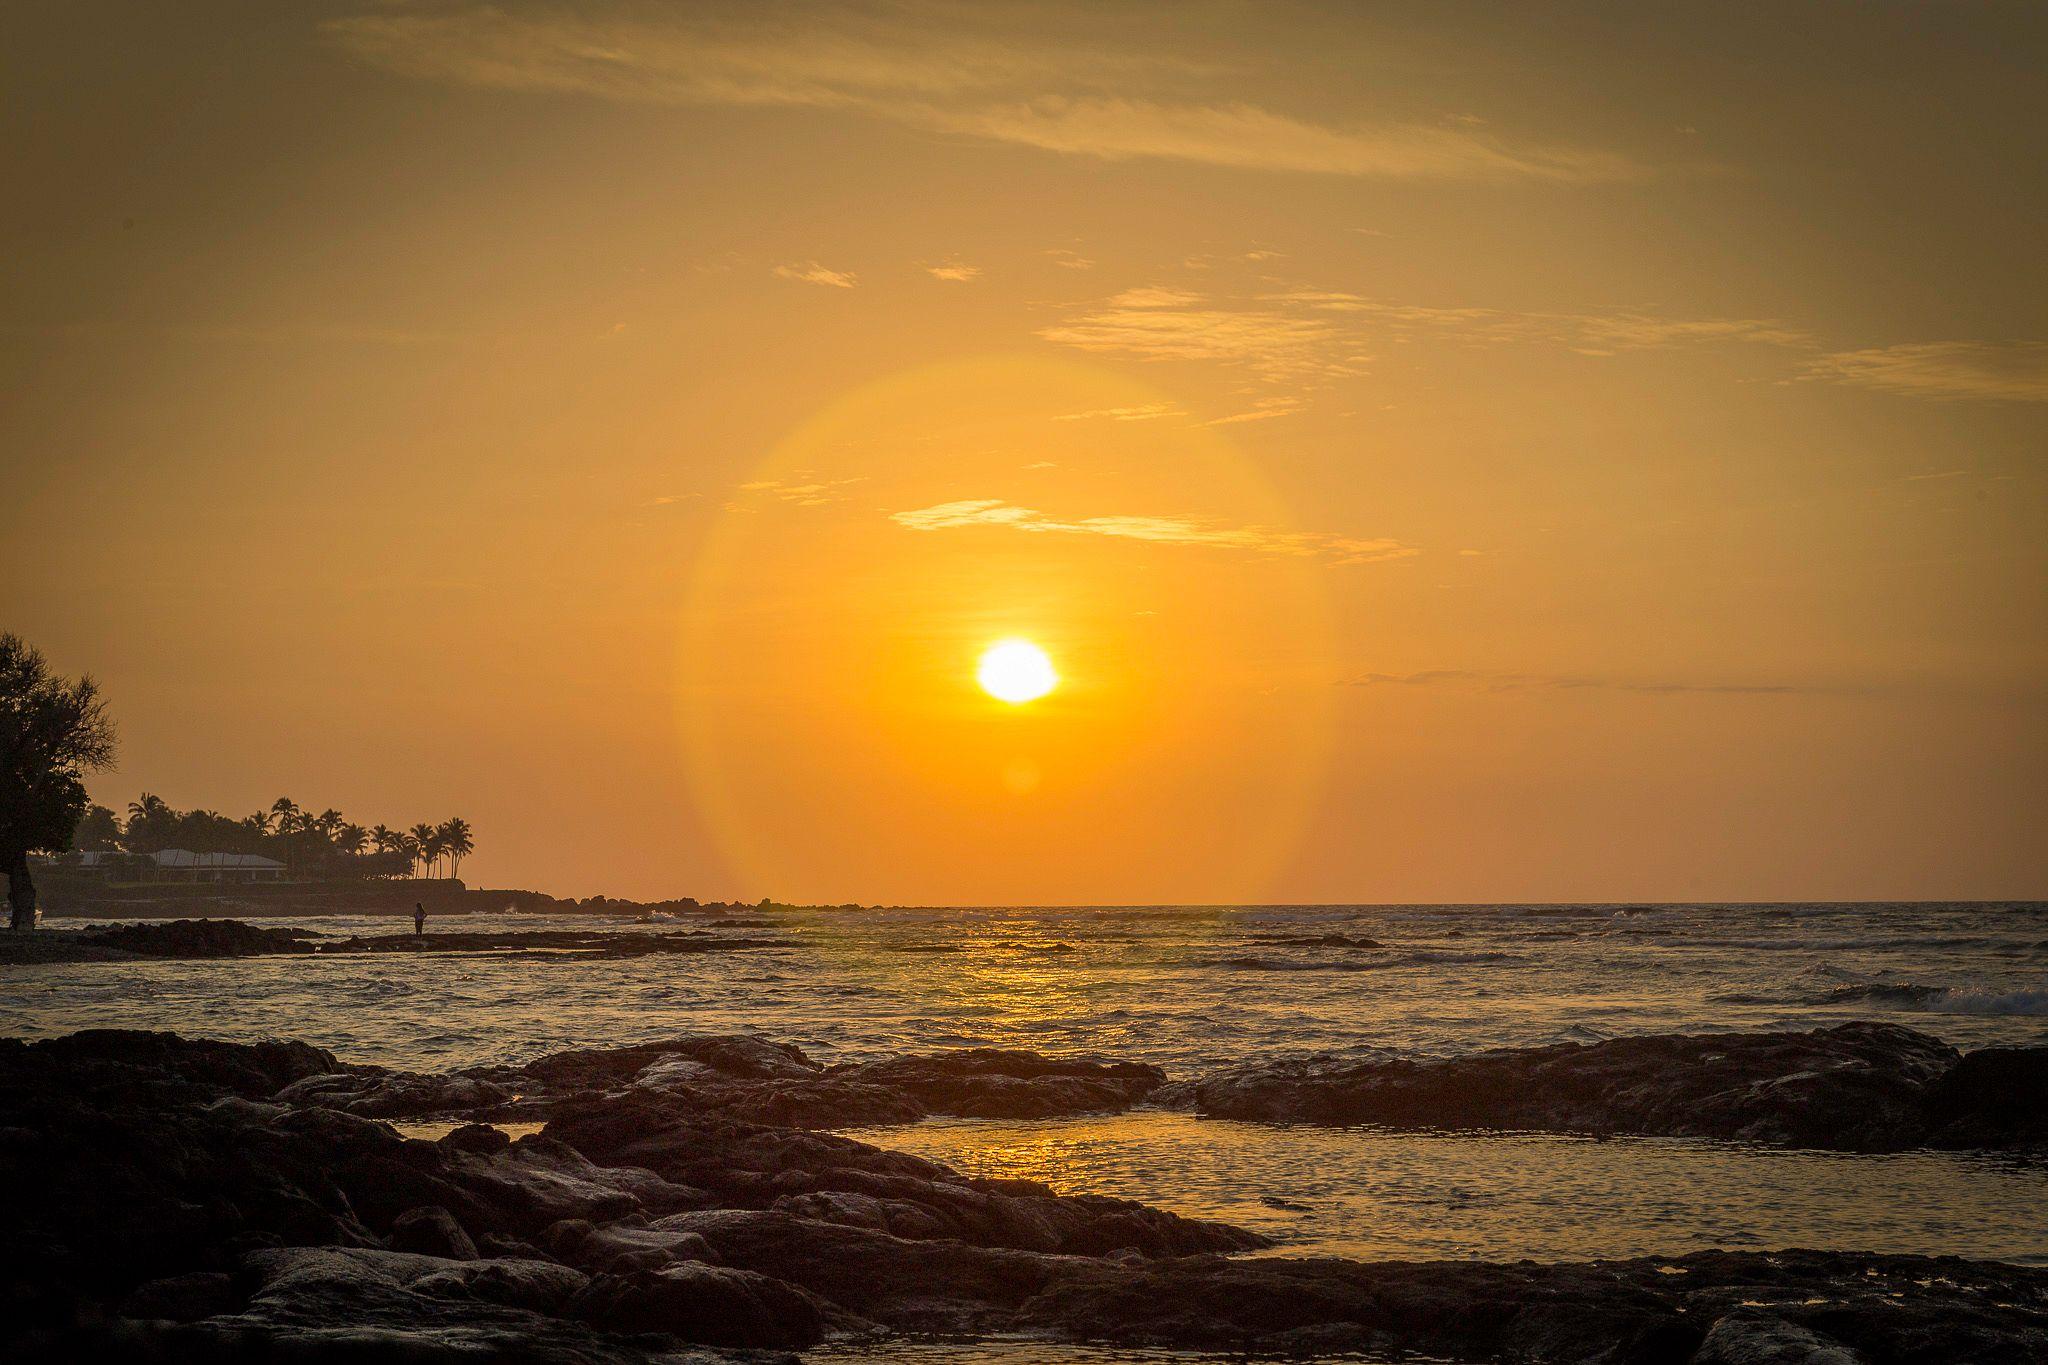 Hawaii sunset in yellow and orange tones.